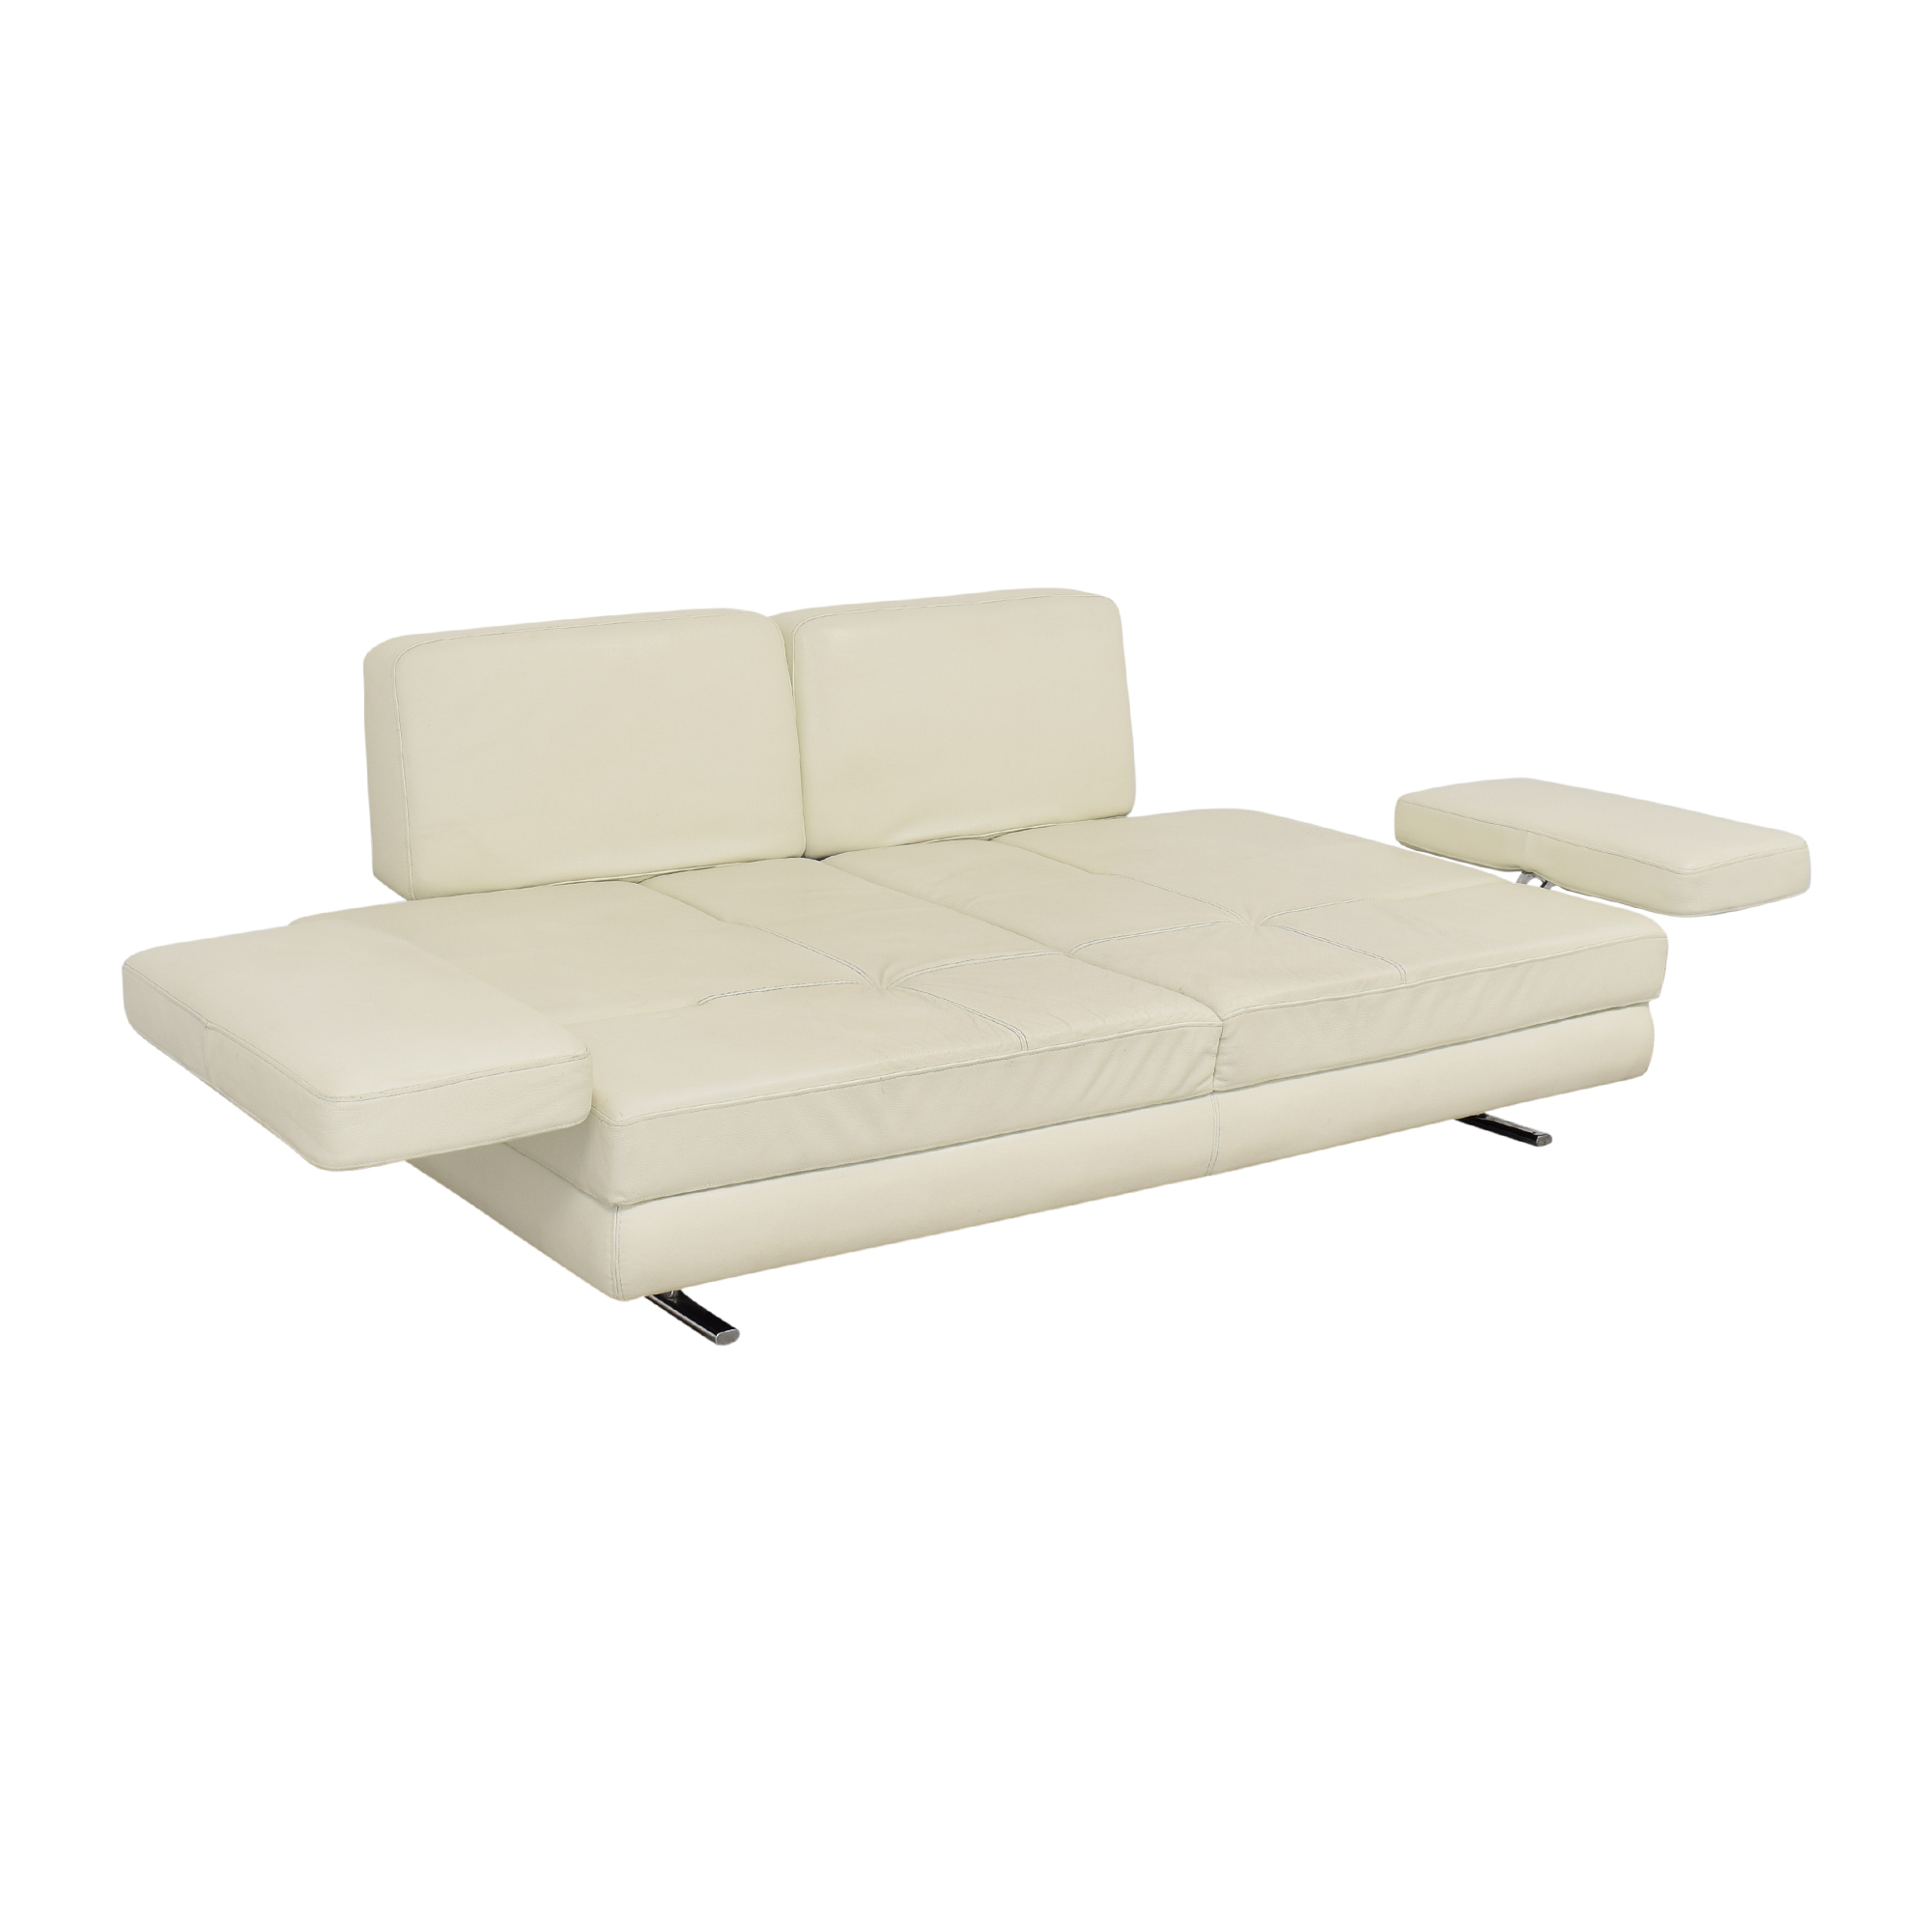 Lazzoni Mony Full Sleeper Sofa Lazzoni